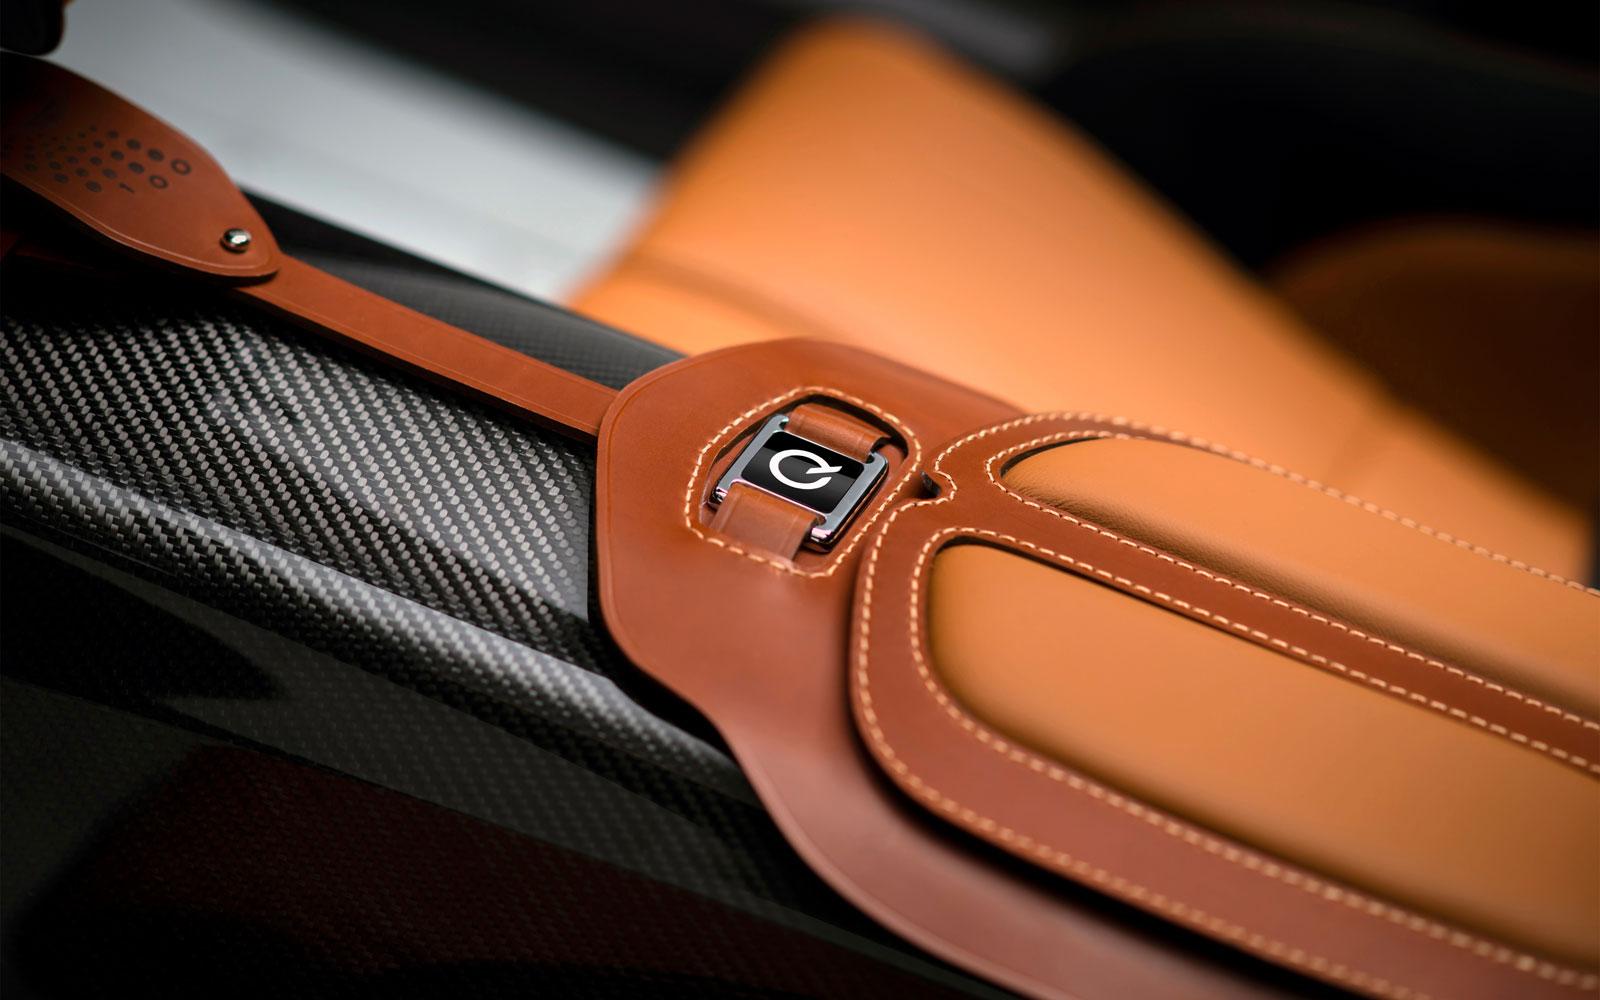 Aston Martin Cc100 Speedster Concept Leather Trim Car Body Design